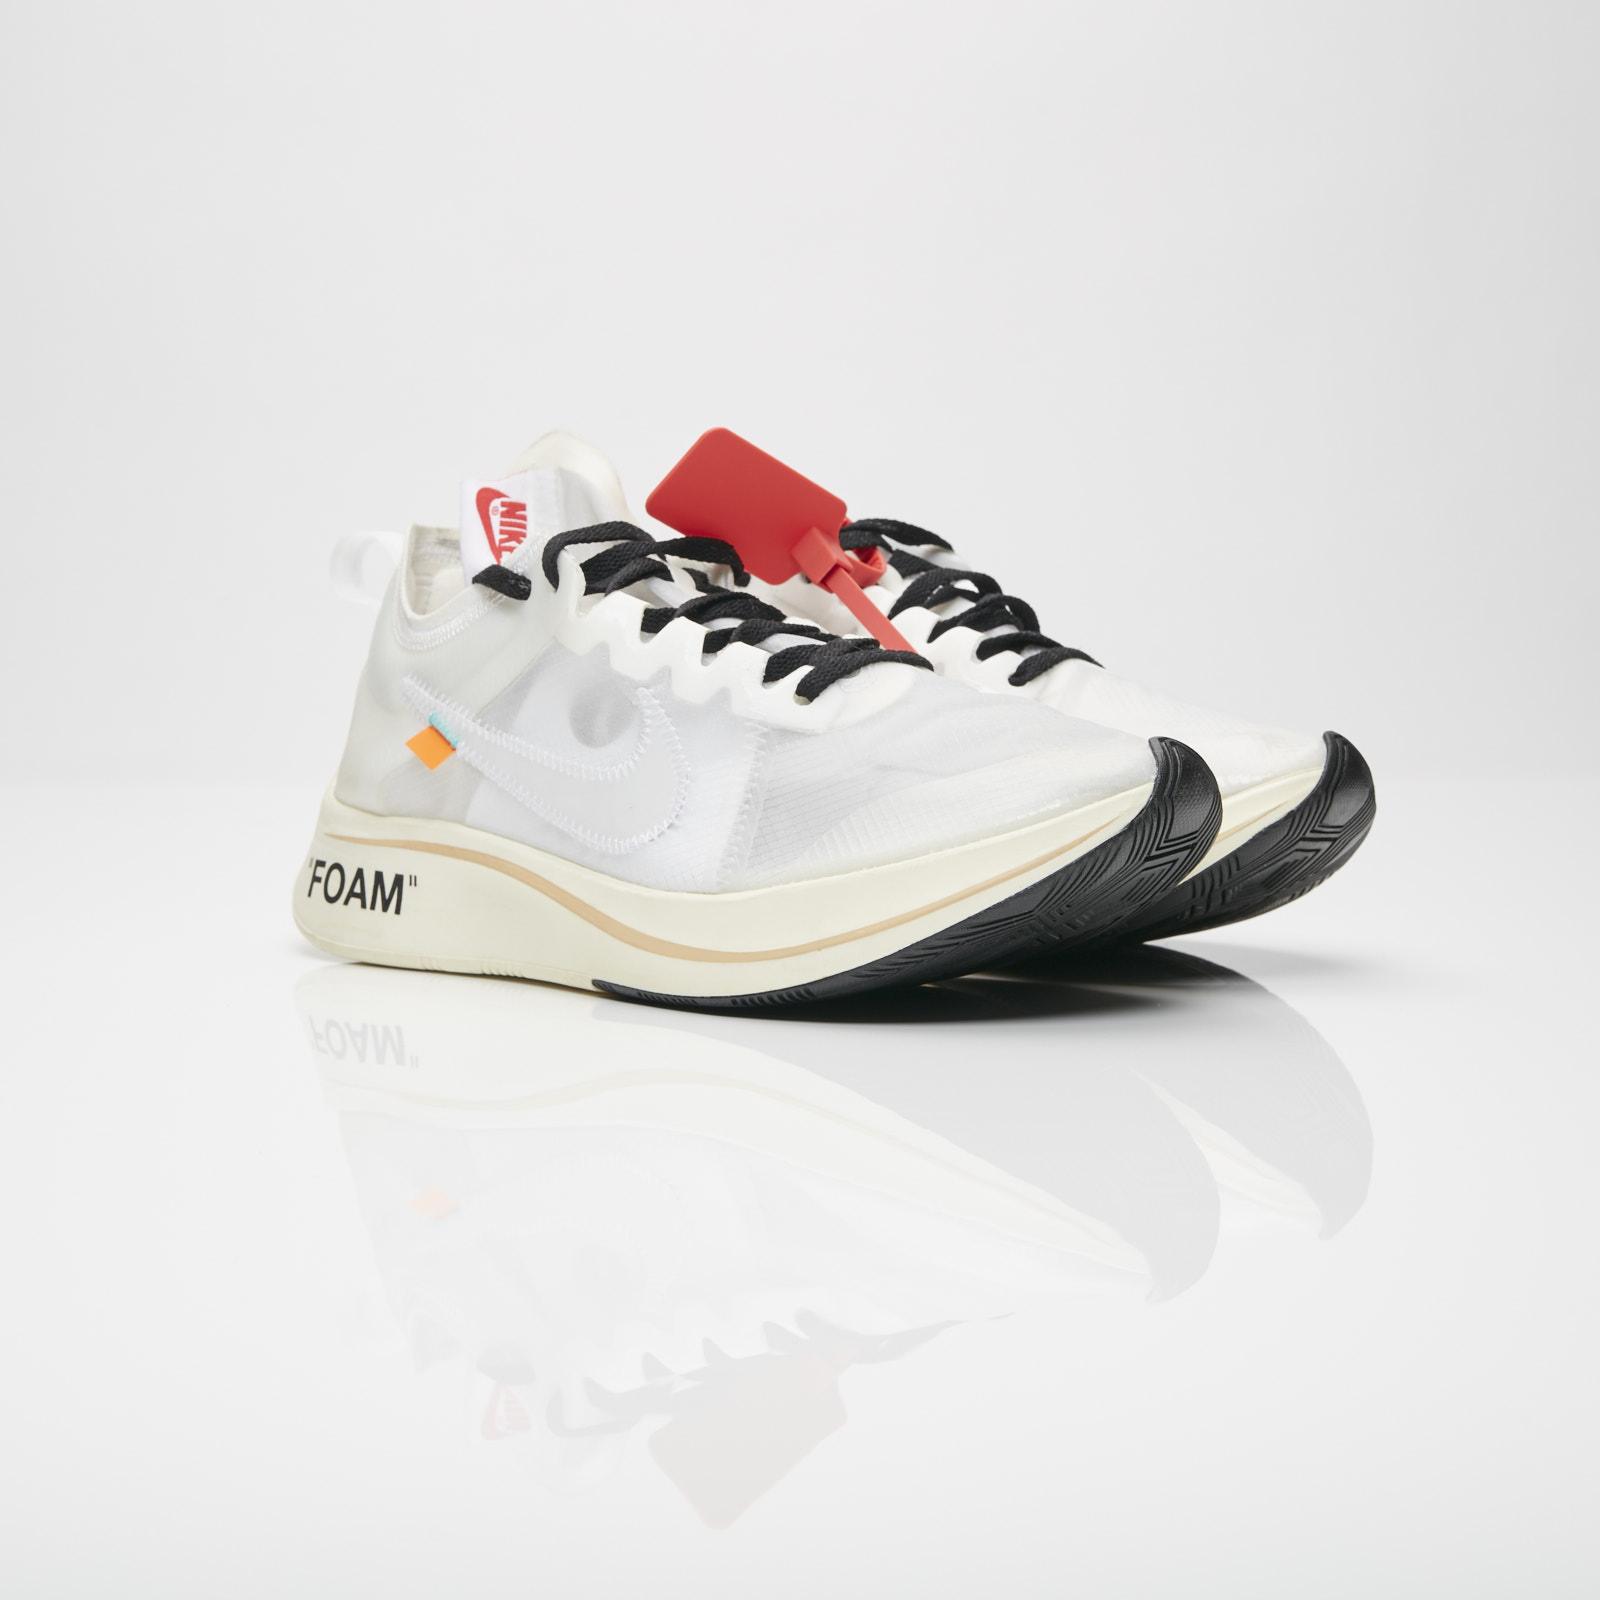 255b21e72a5e Nike The 10  Zoom Fly - Aj4588-100 - Sneakersnstuff